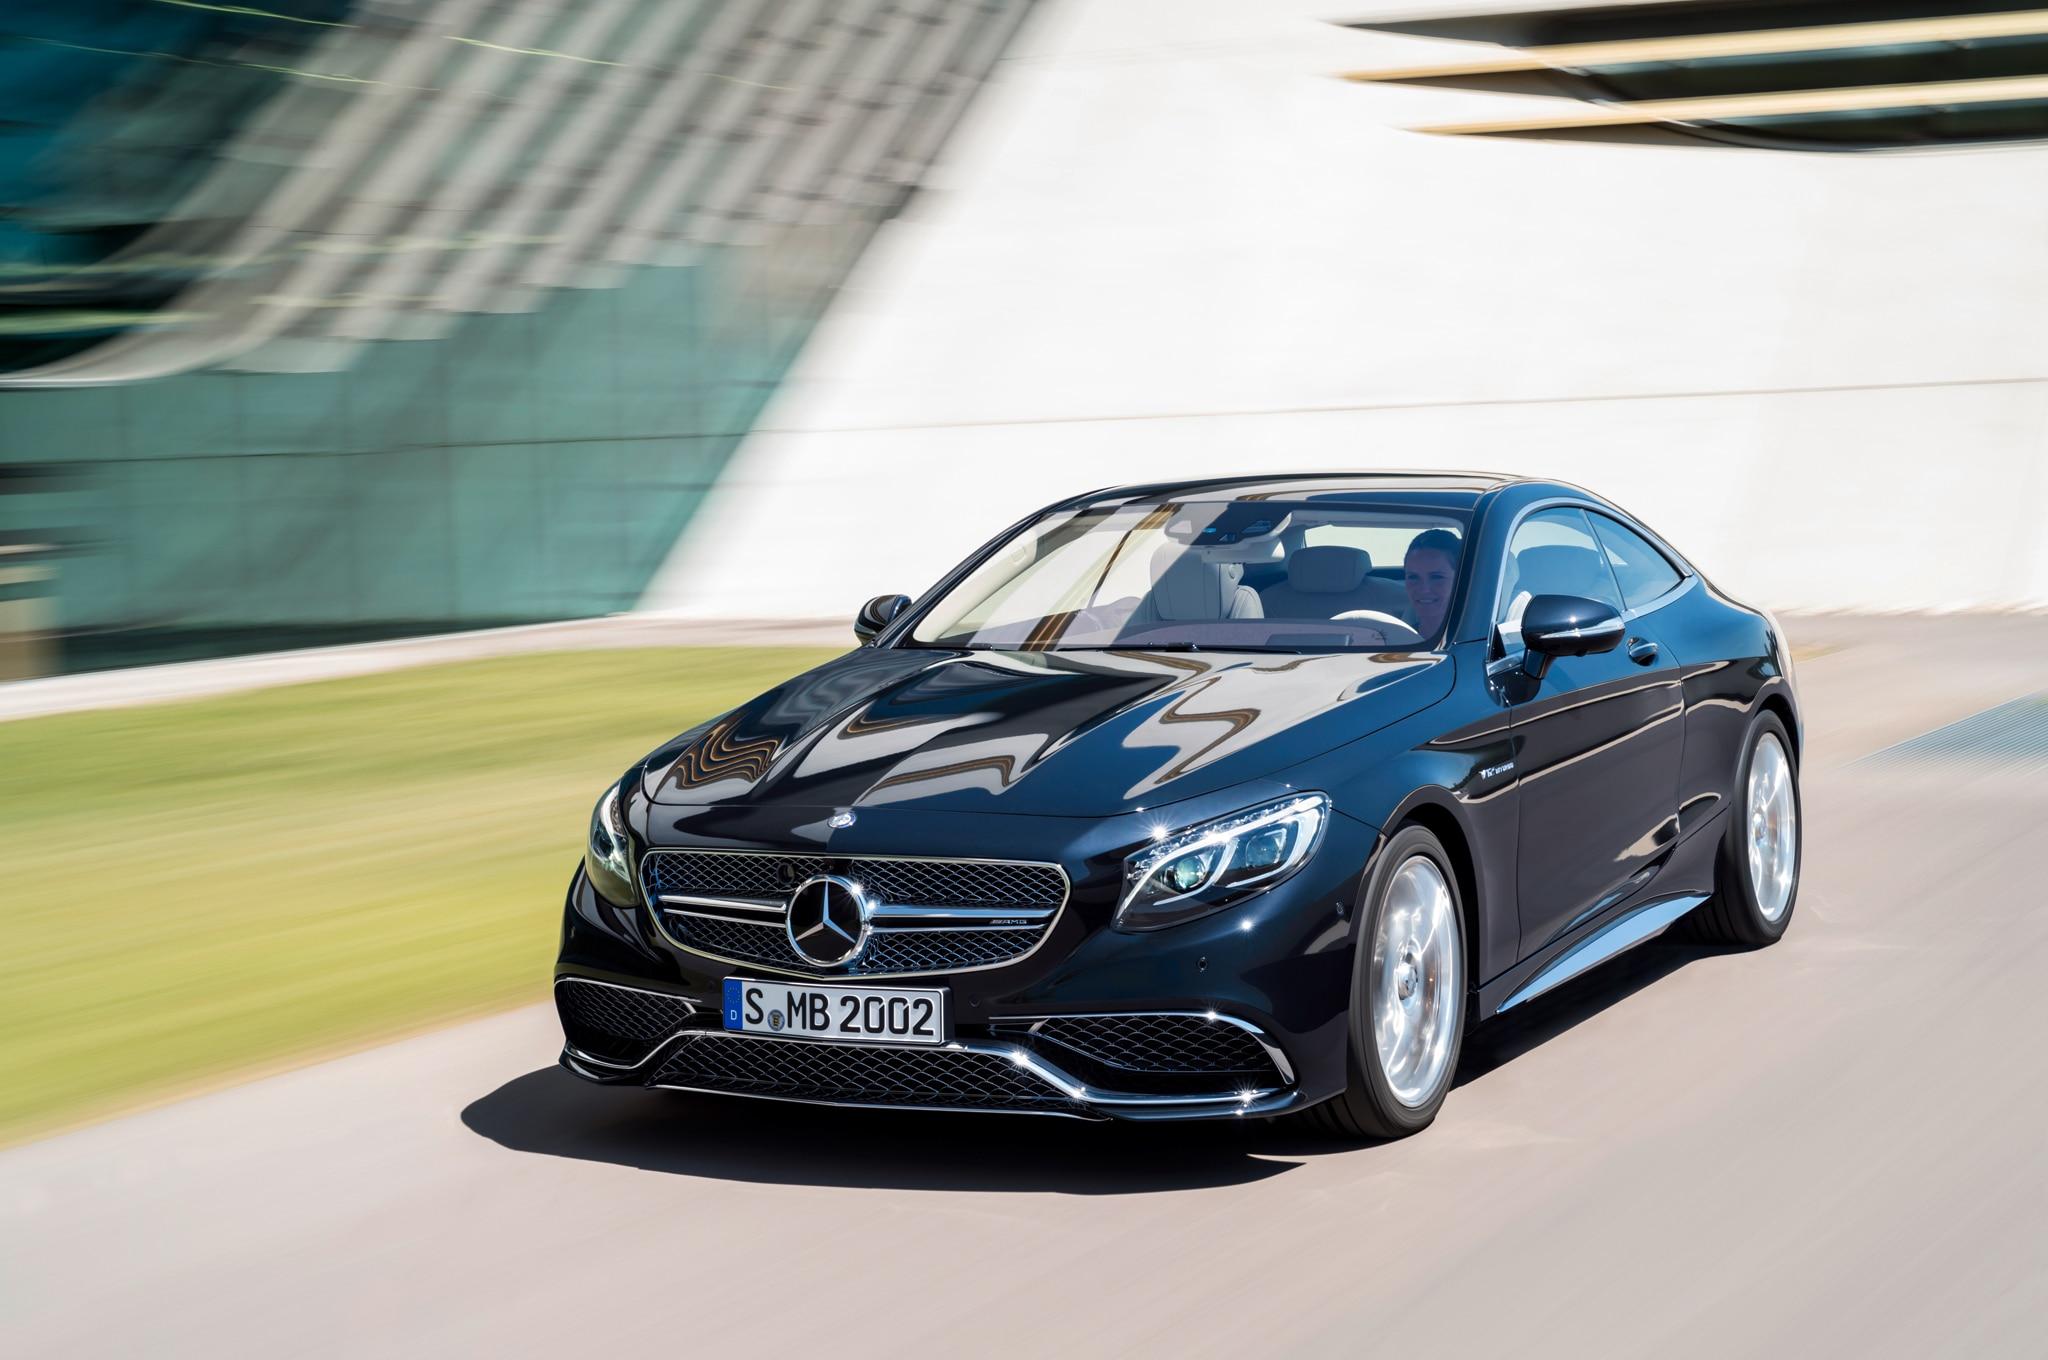 http://st.automobilemag.com/uploads/sites/11/2014/11/2015-Mercedes-Benz-S65-AMG-Coupe-promo.jpg